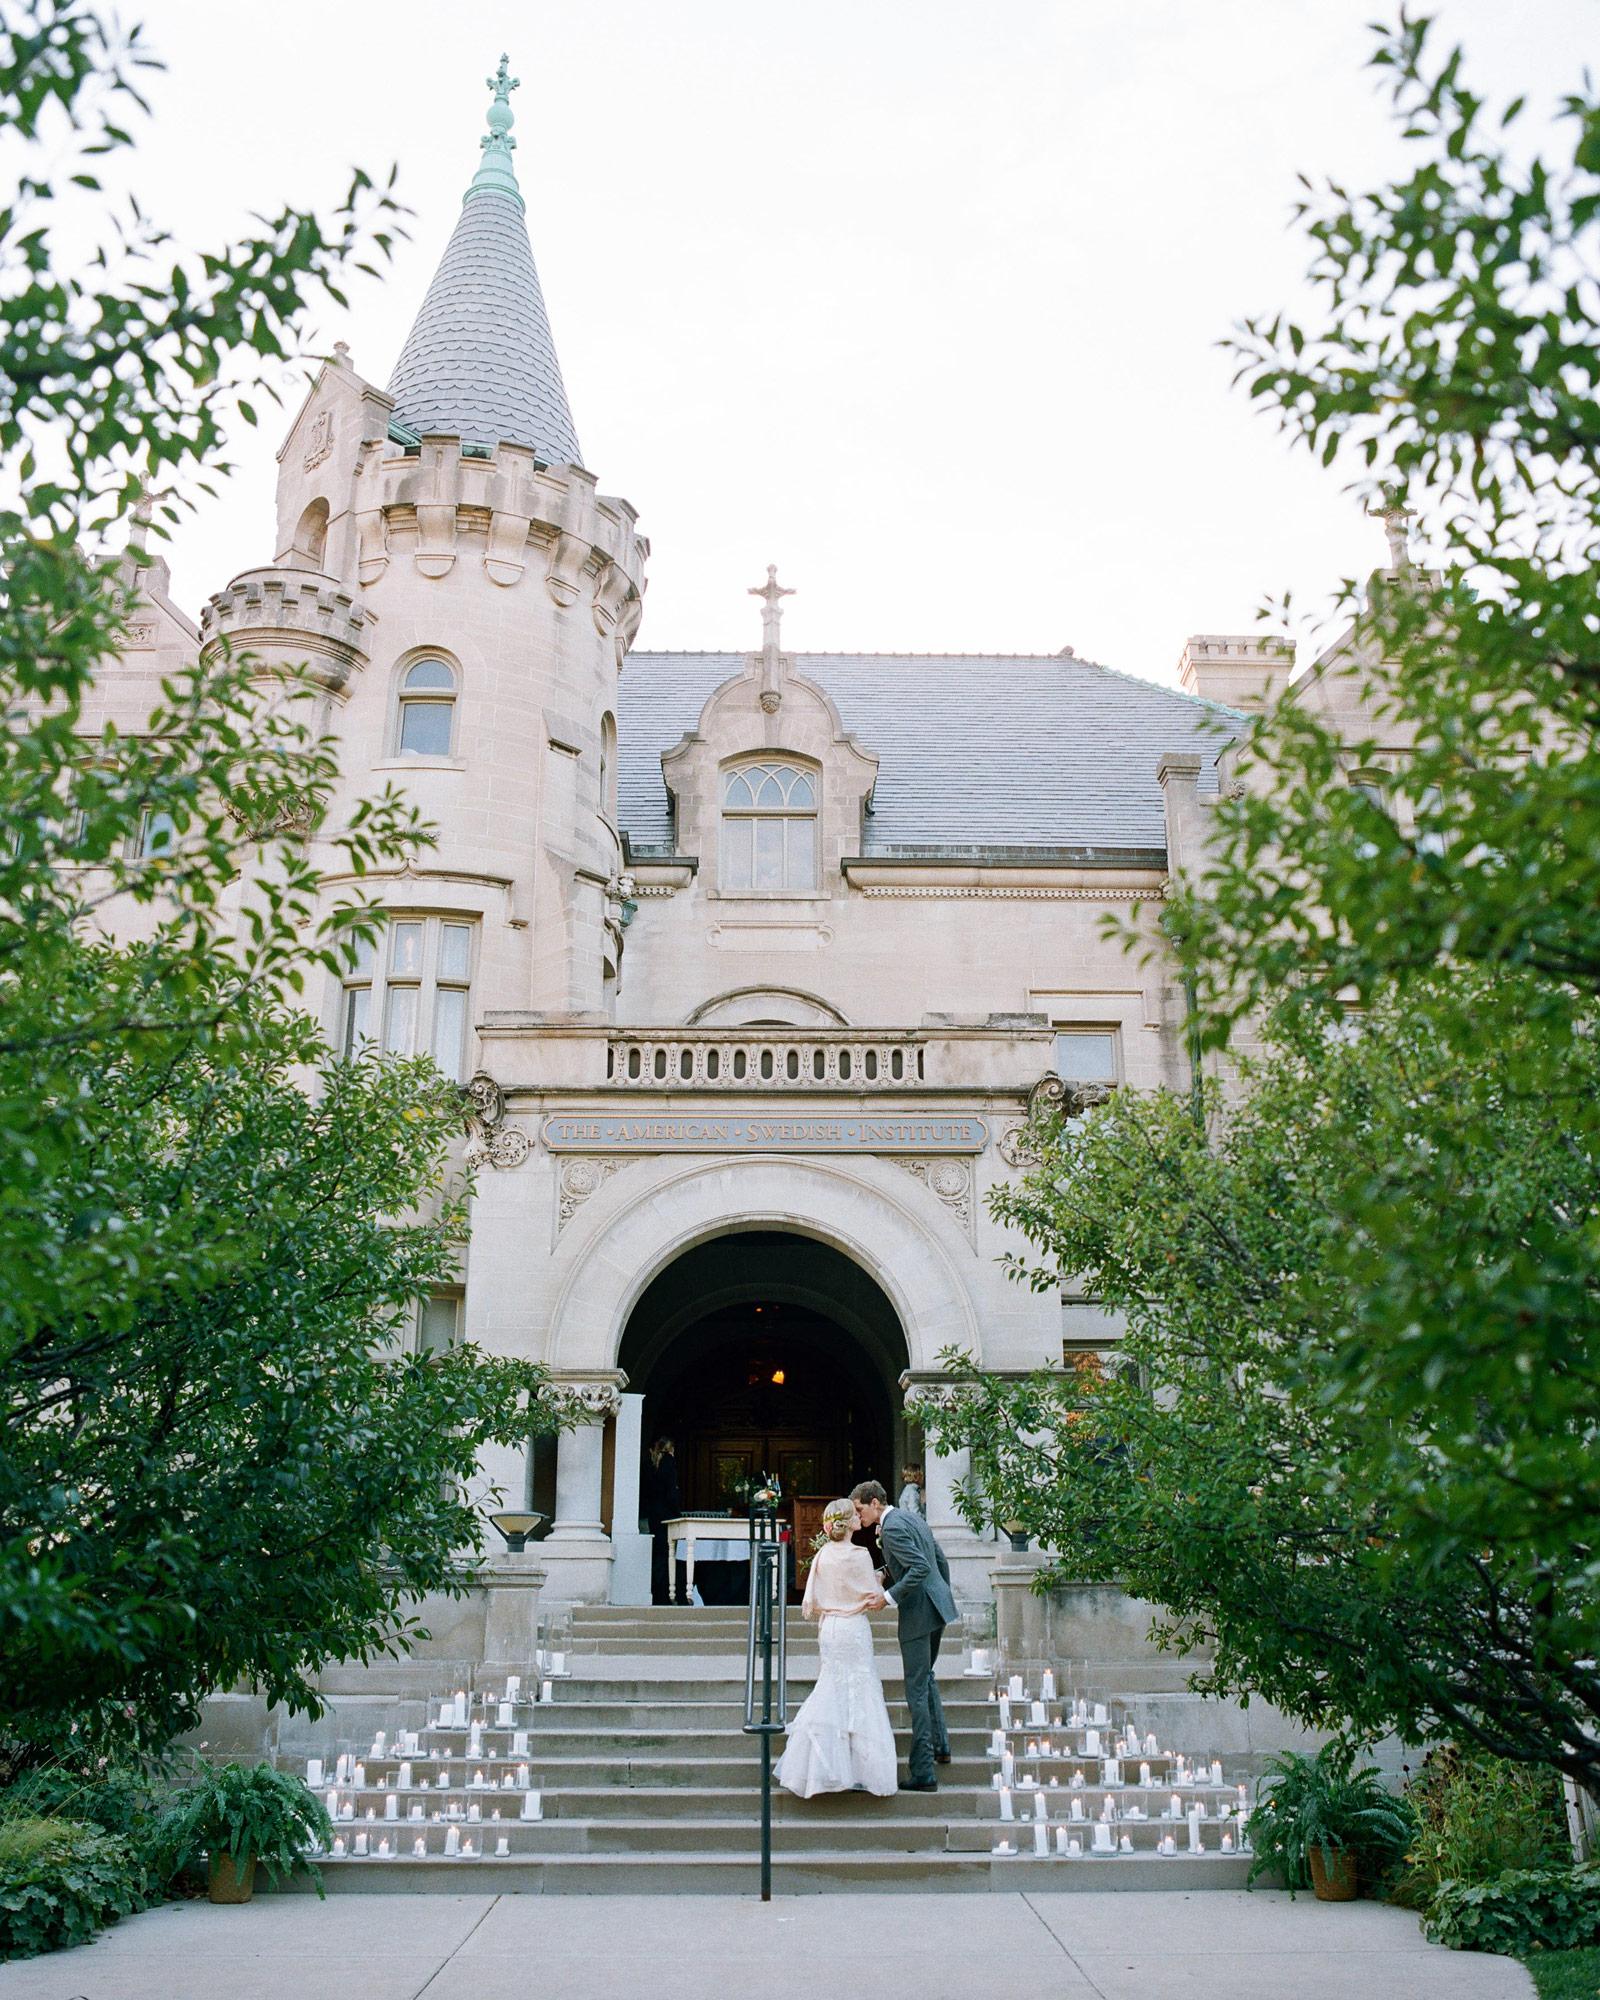 adrienne-jason-wedding-minnesota-exterior-0090-s111925.jpg